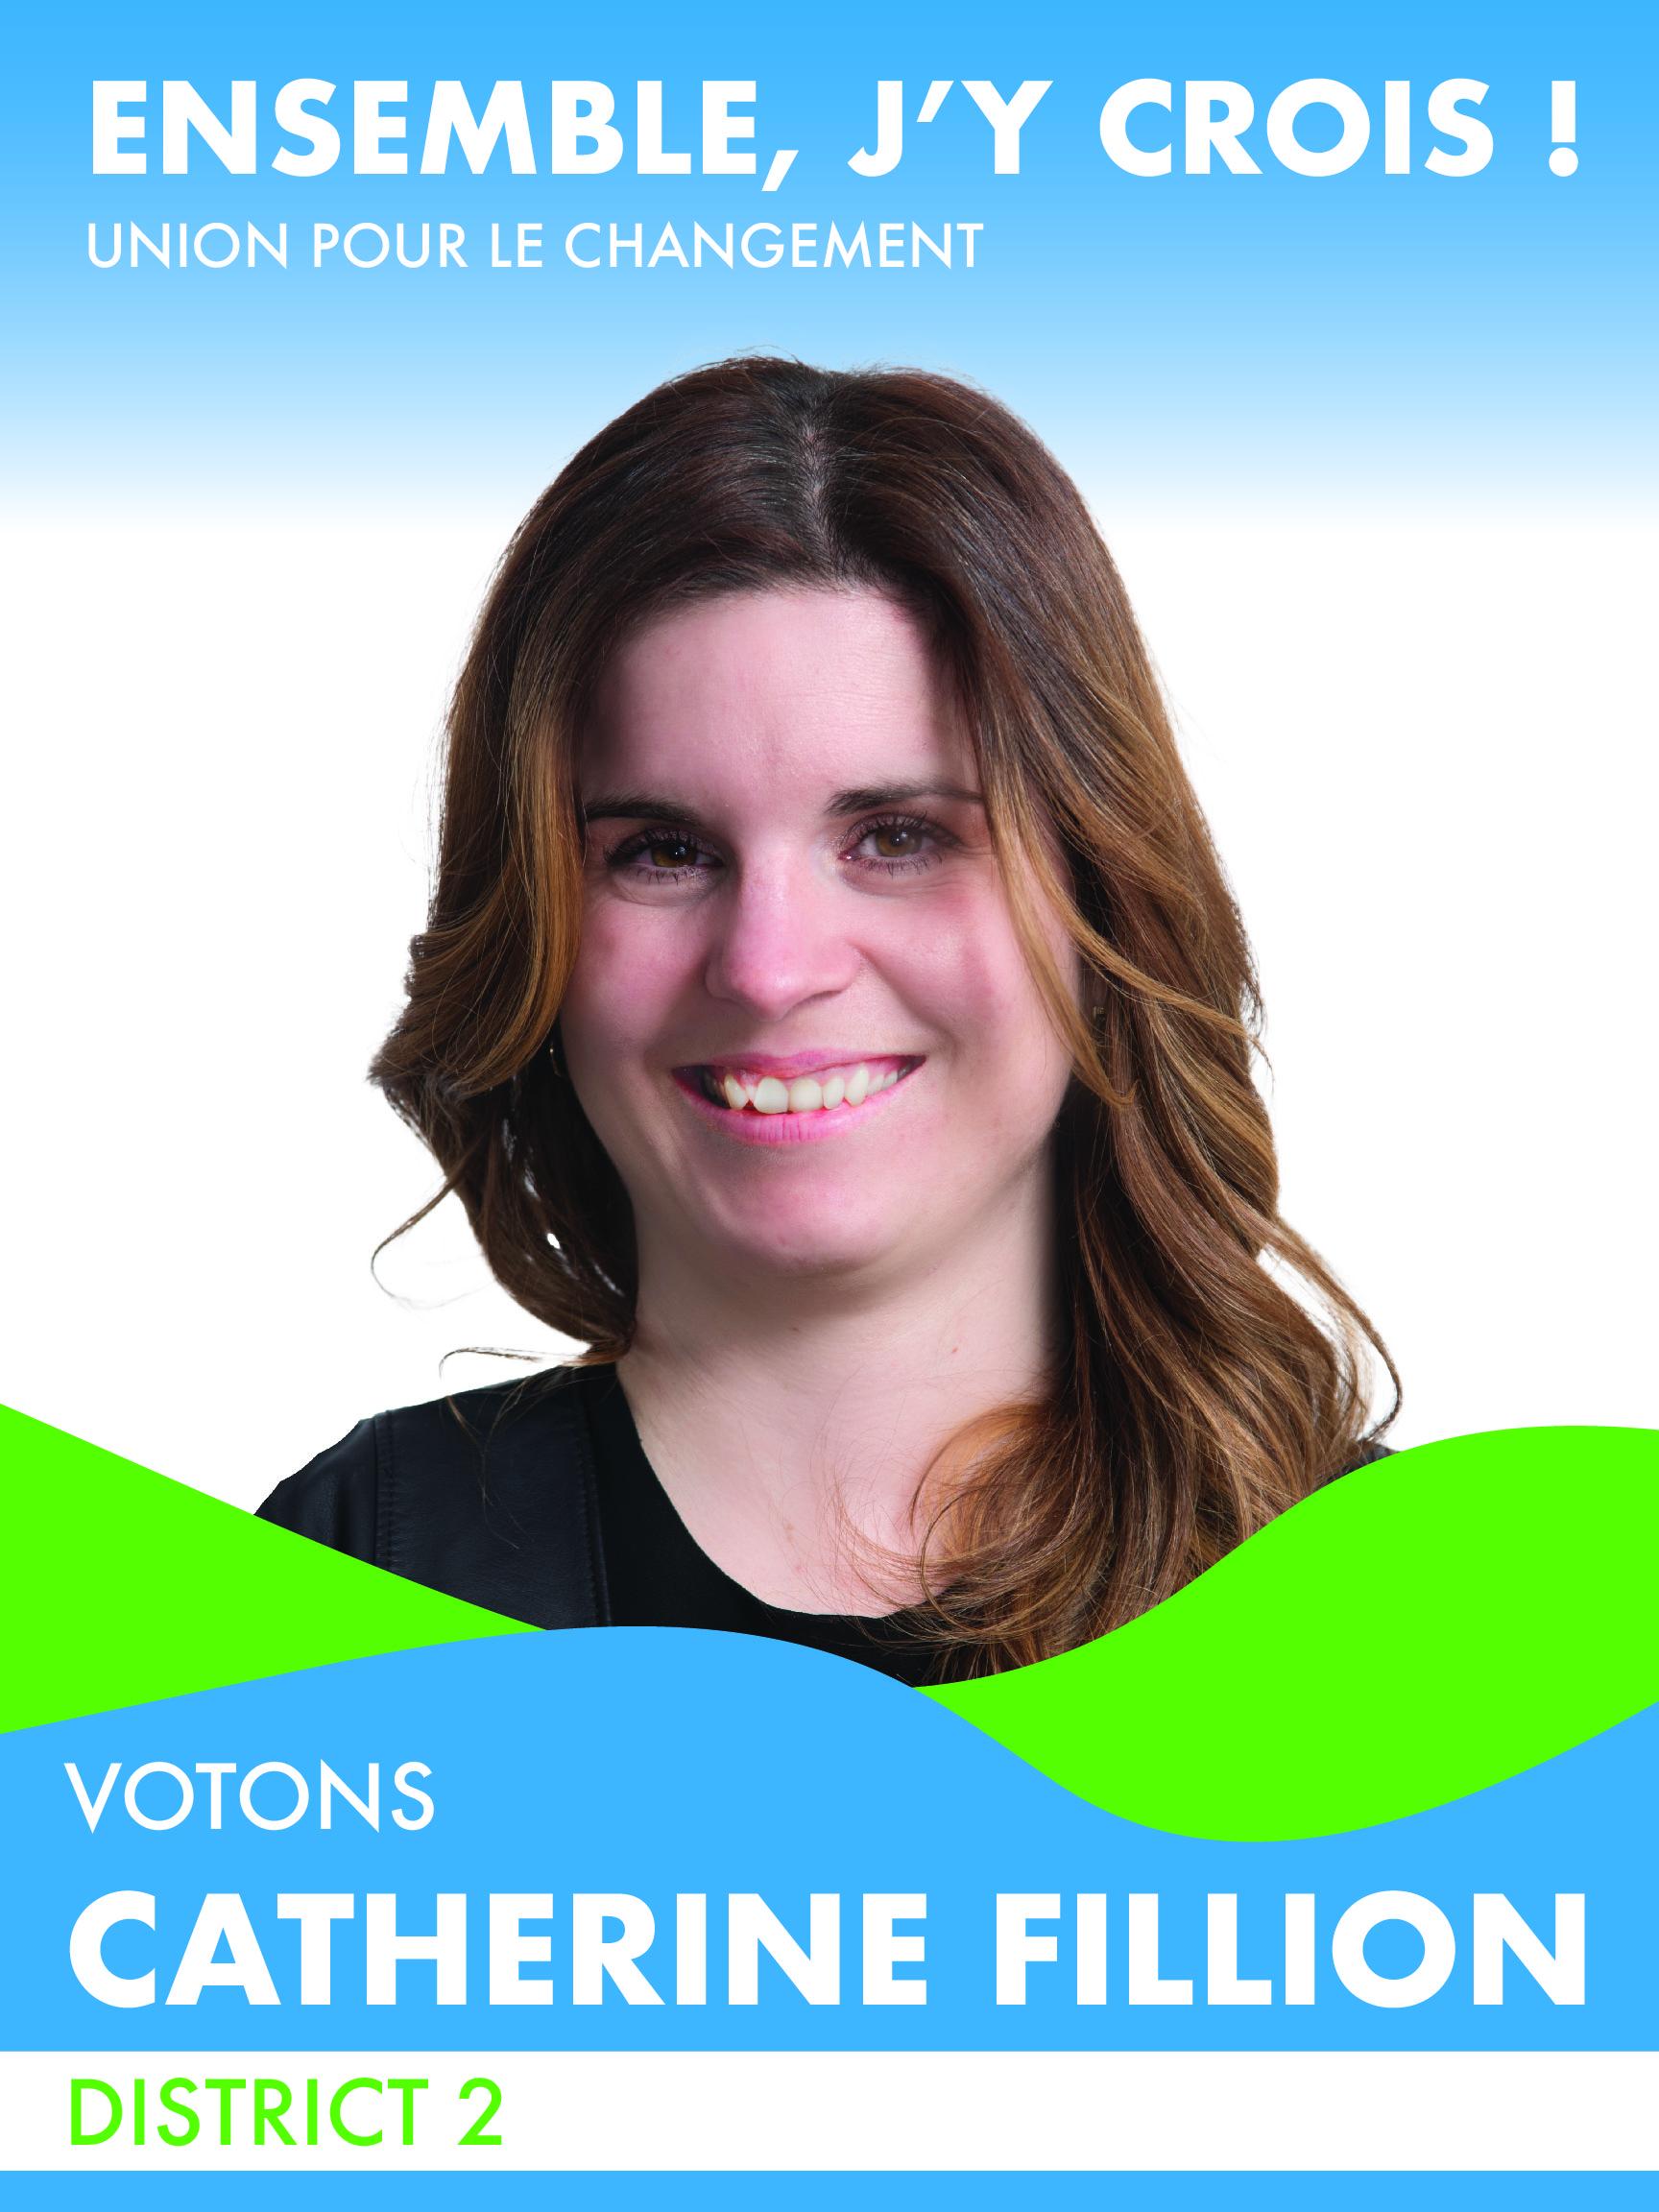 Catherine Fillion